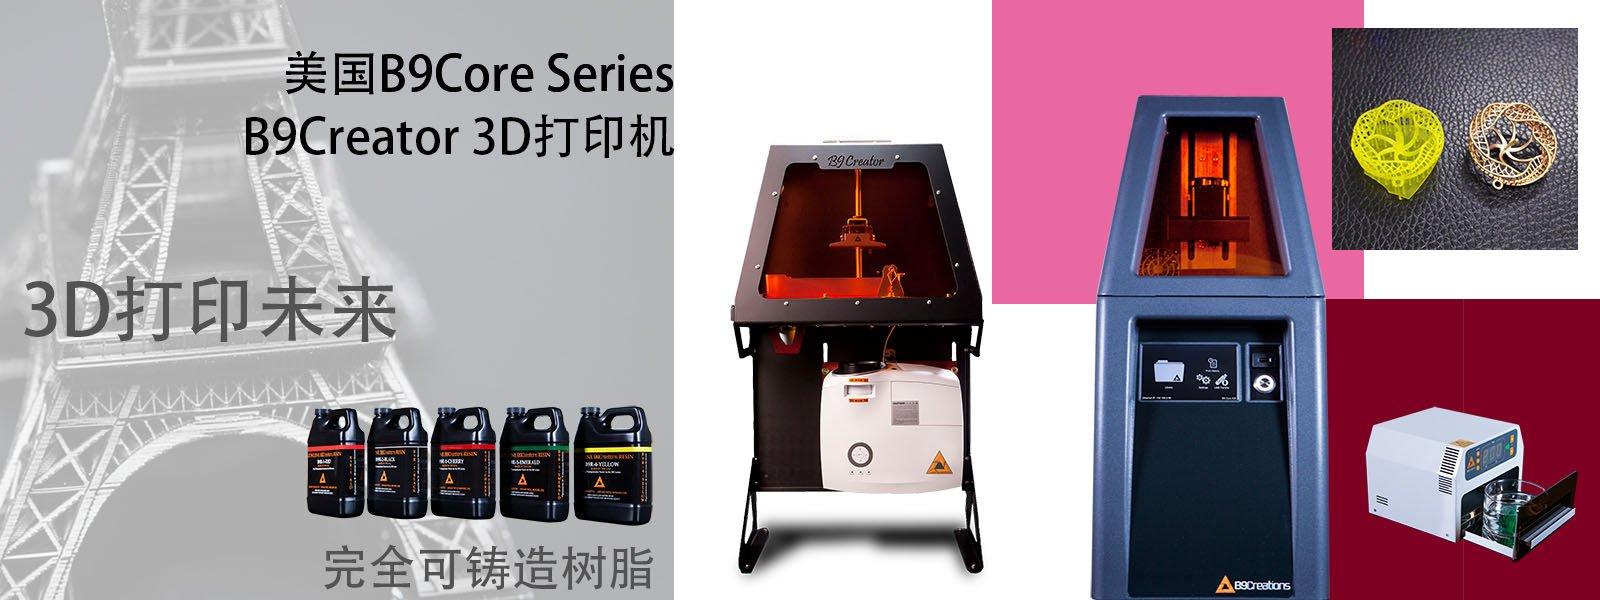 B9Creator|B9 Core Series 3D打印机